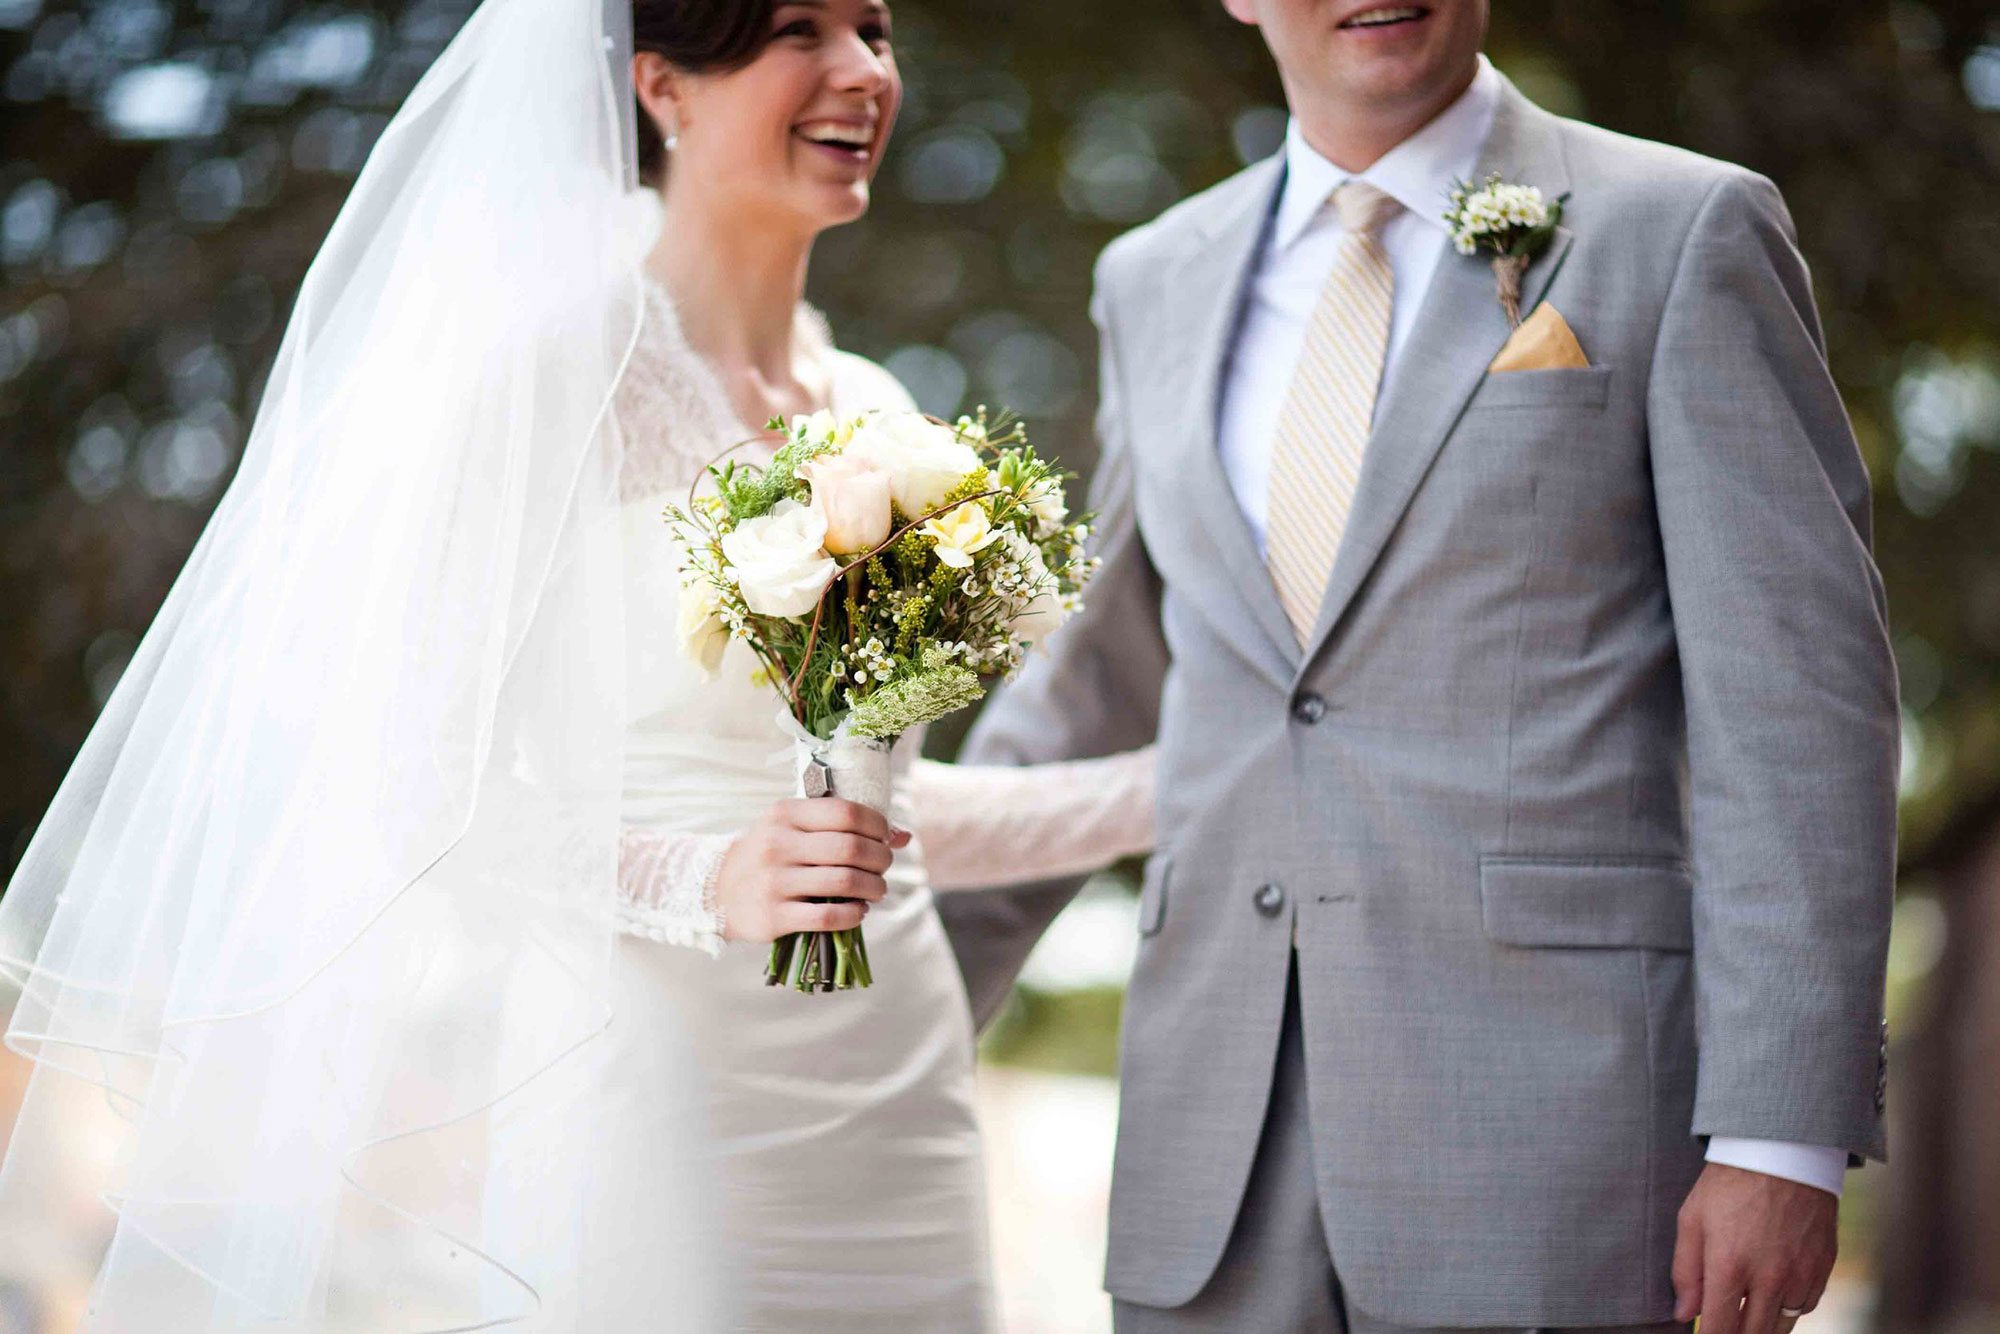 Amanda-Cowley-Willowbank-Vineyard-Bride-Photo-By-White-Photographie-009.jpg